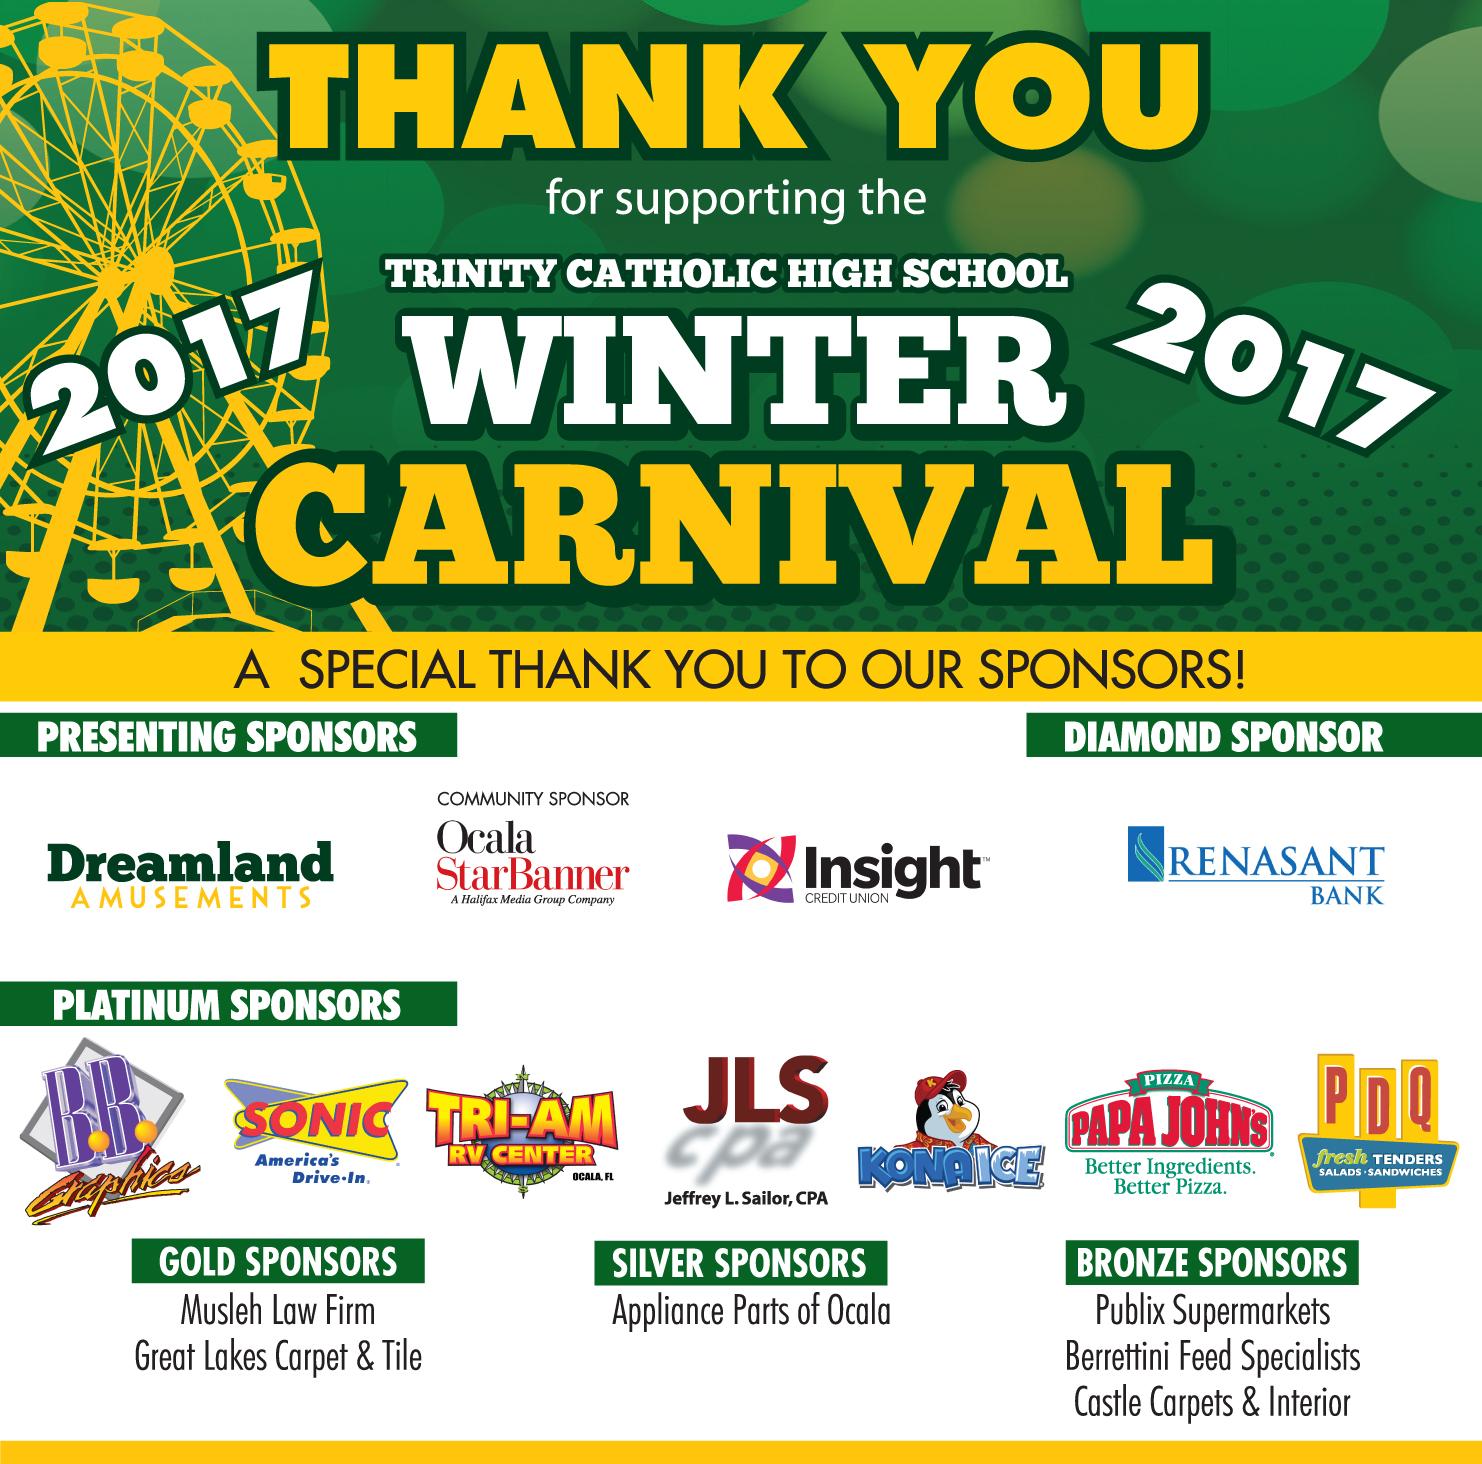 TC_CarnivalThankYouAd_2017